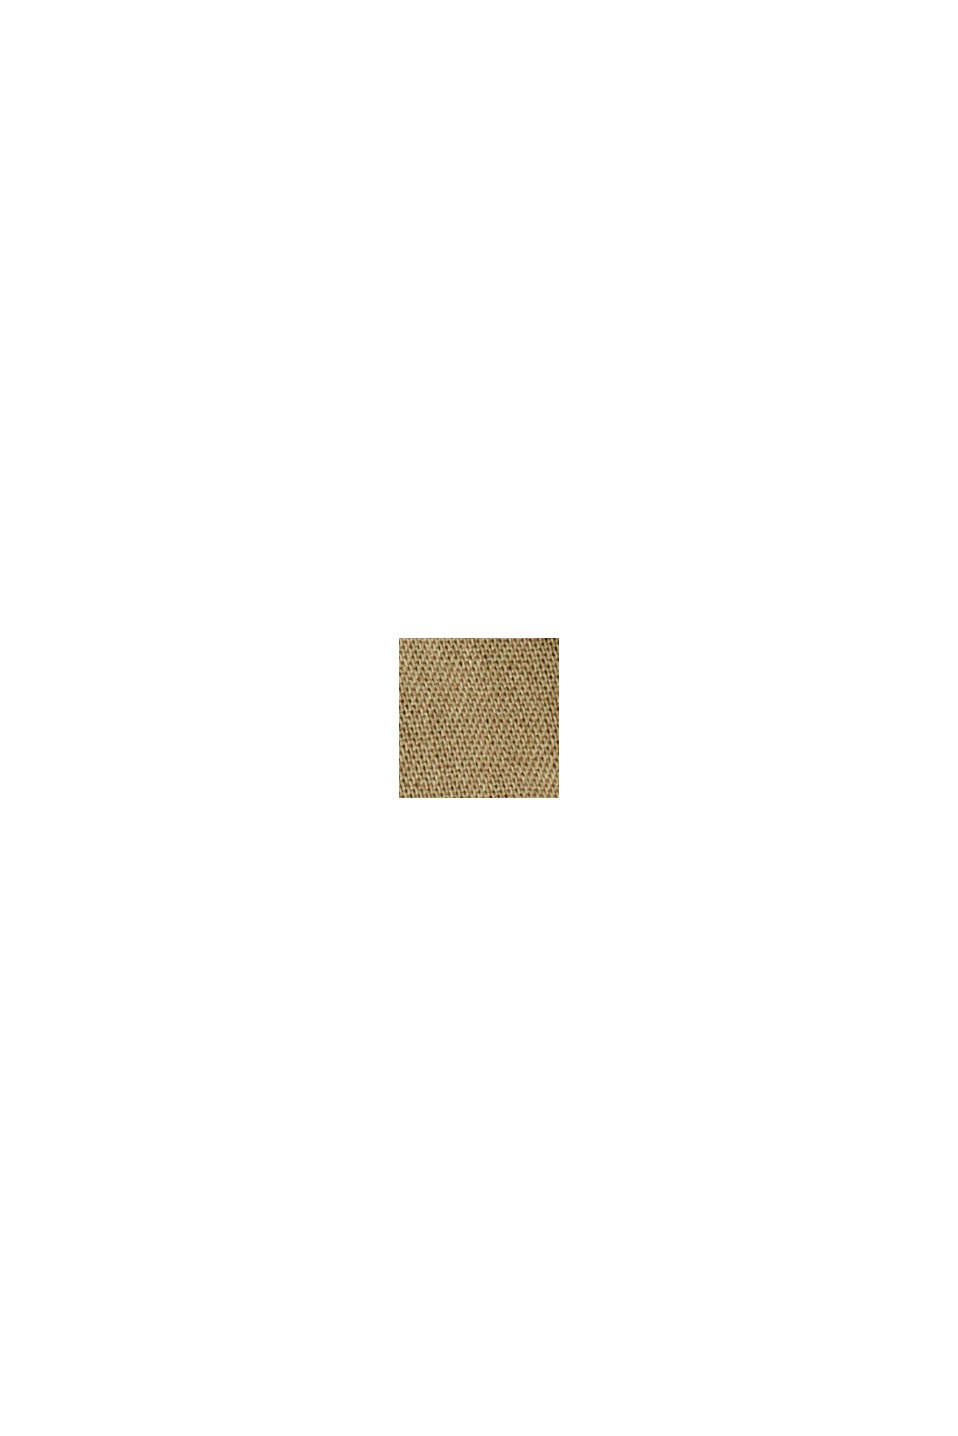 EarthColors® lange blouse, biologisch katoen, OLIVE, swatch